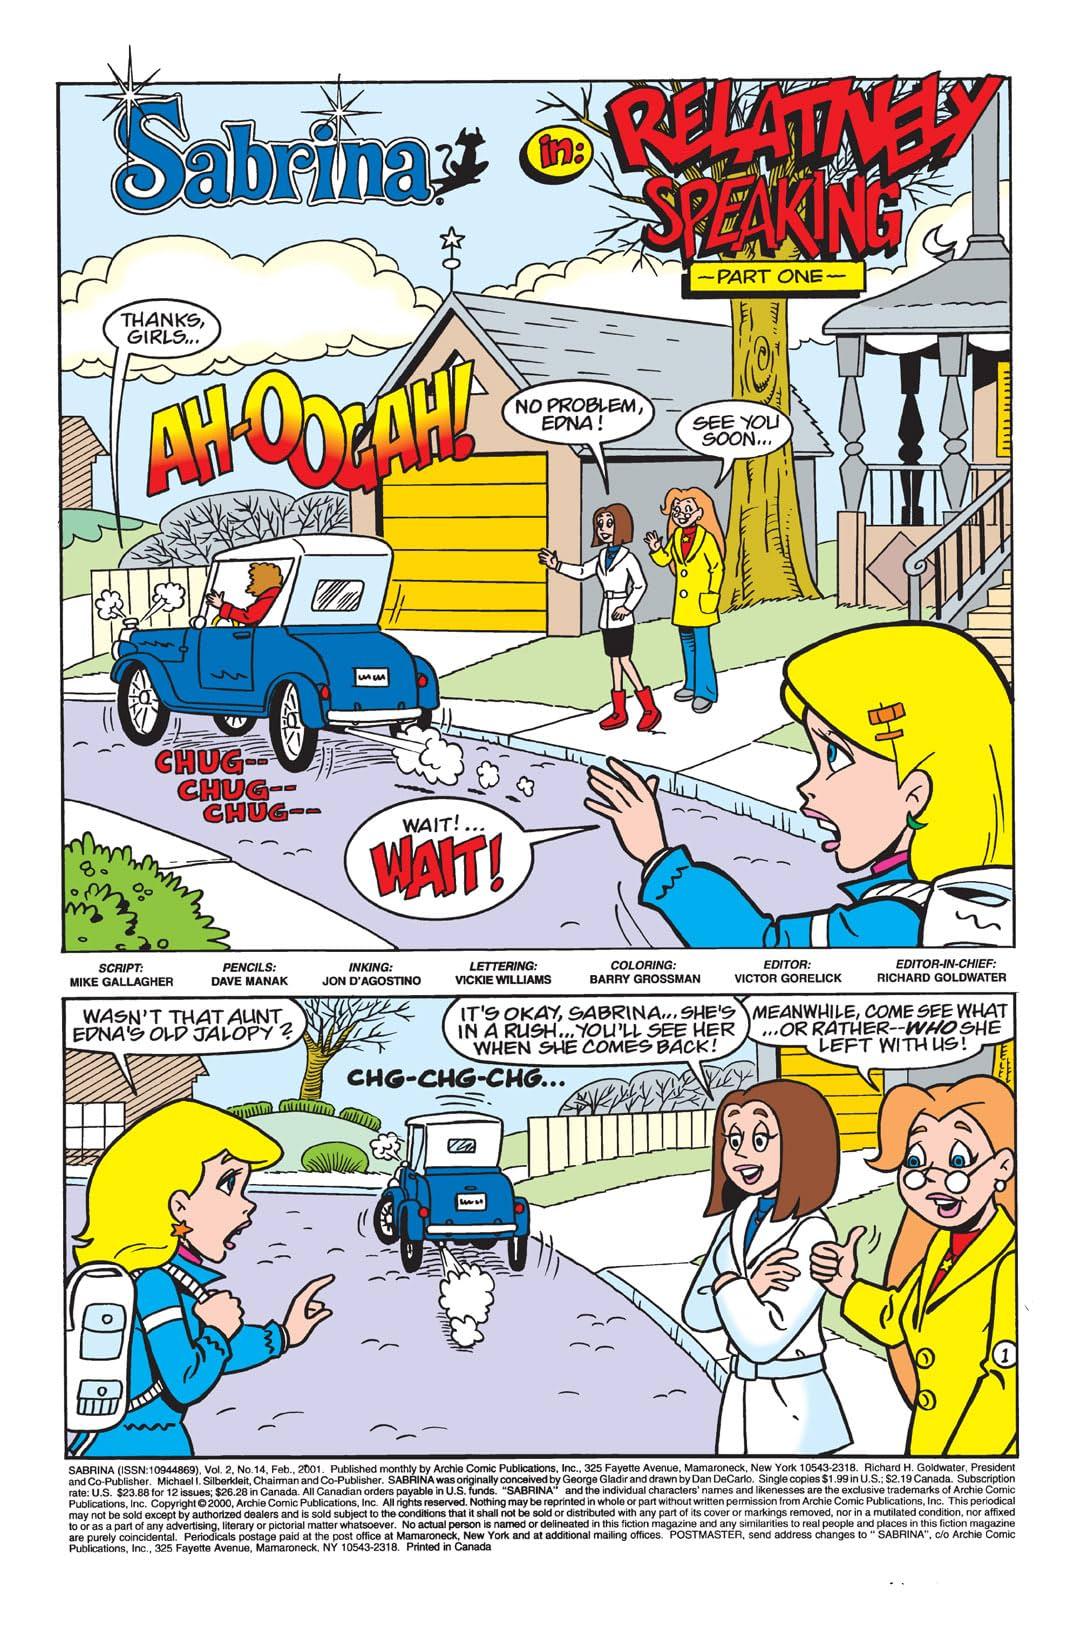 Sabrina the Teenage Witch Animated Series #14